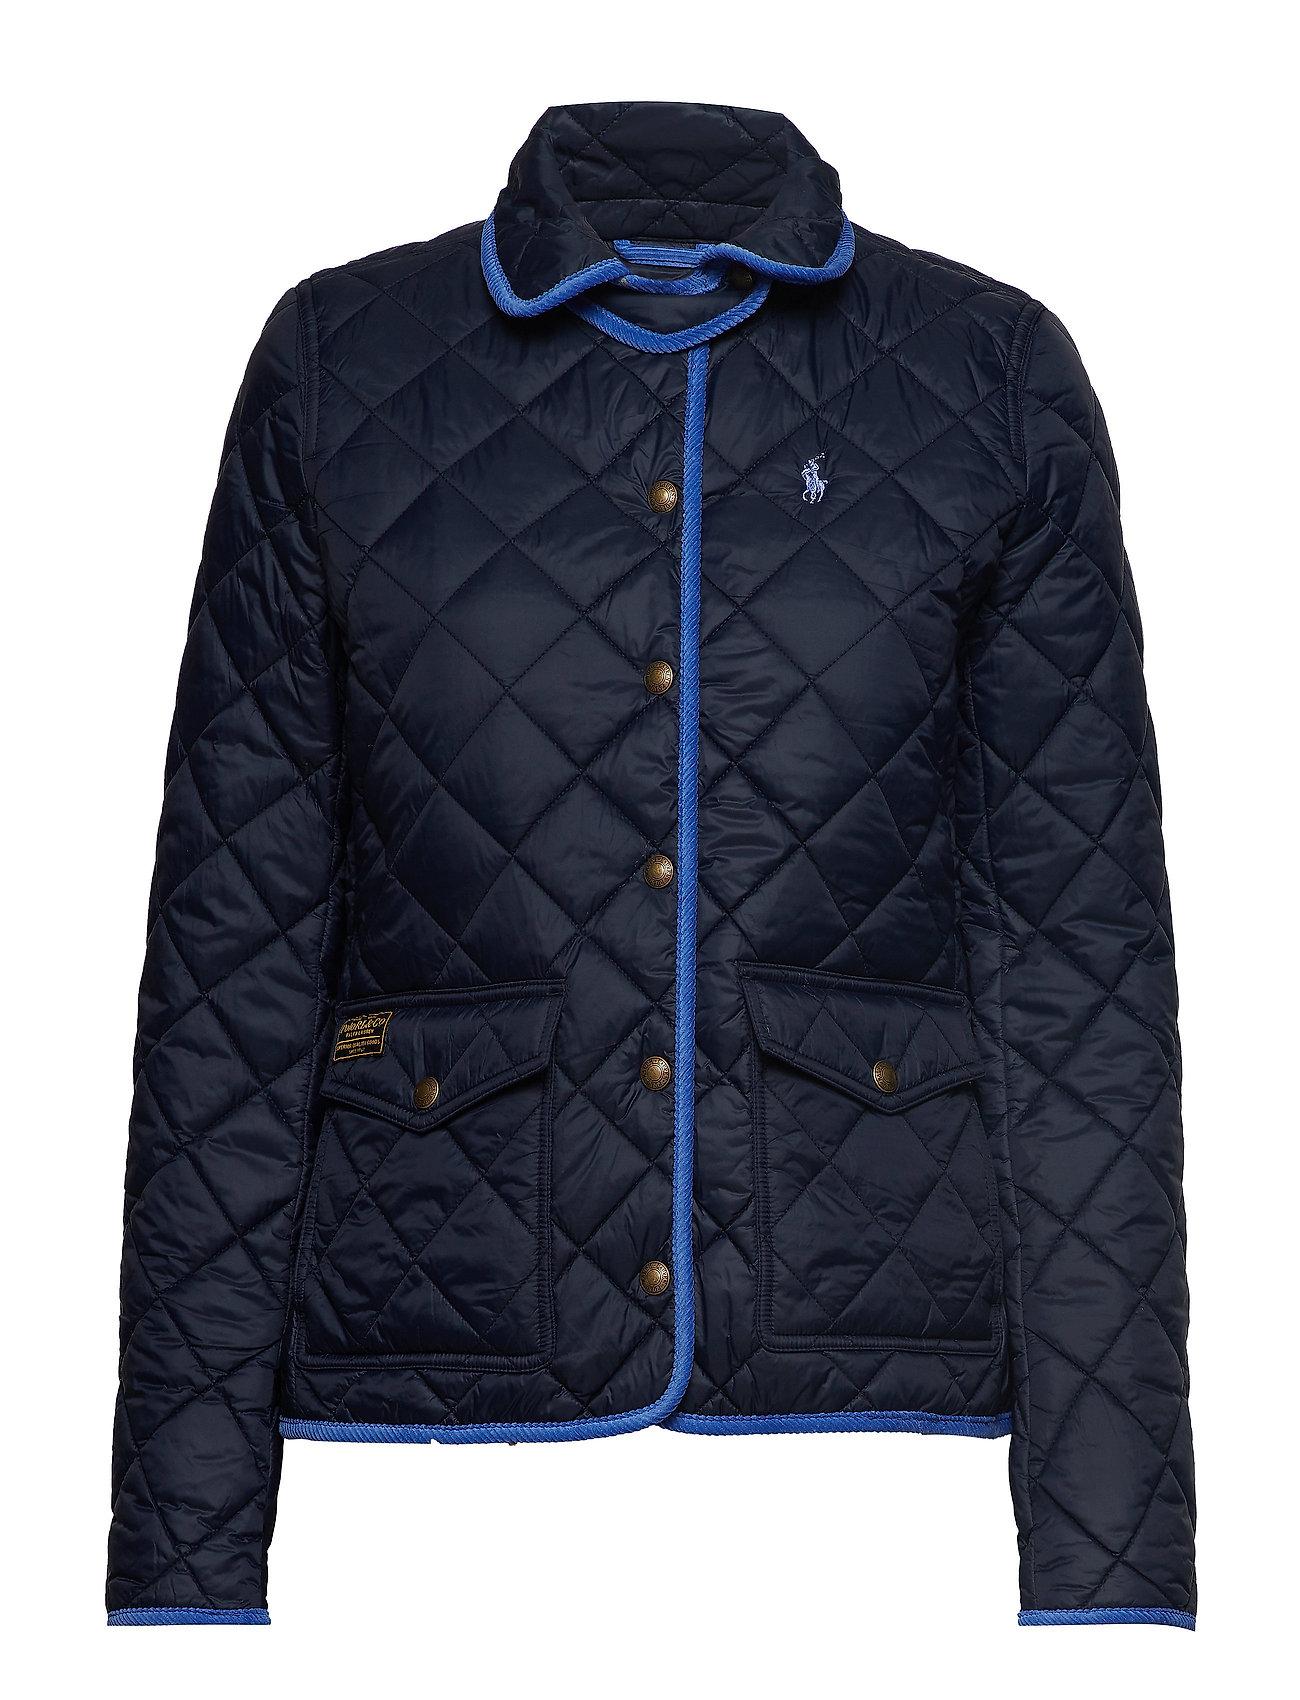 Polo Ralph Lauren Quilted Jacket - AVIATOR NAVY